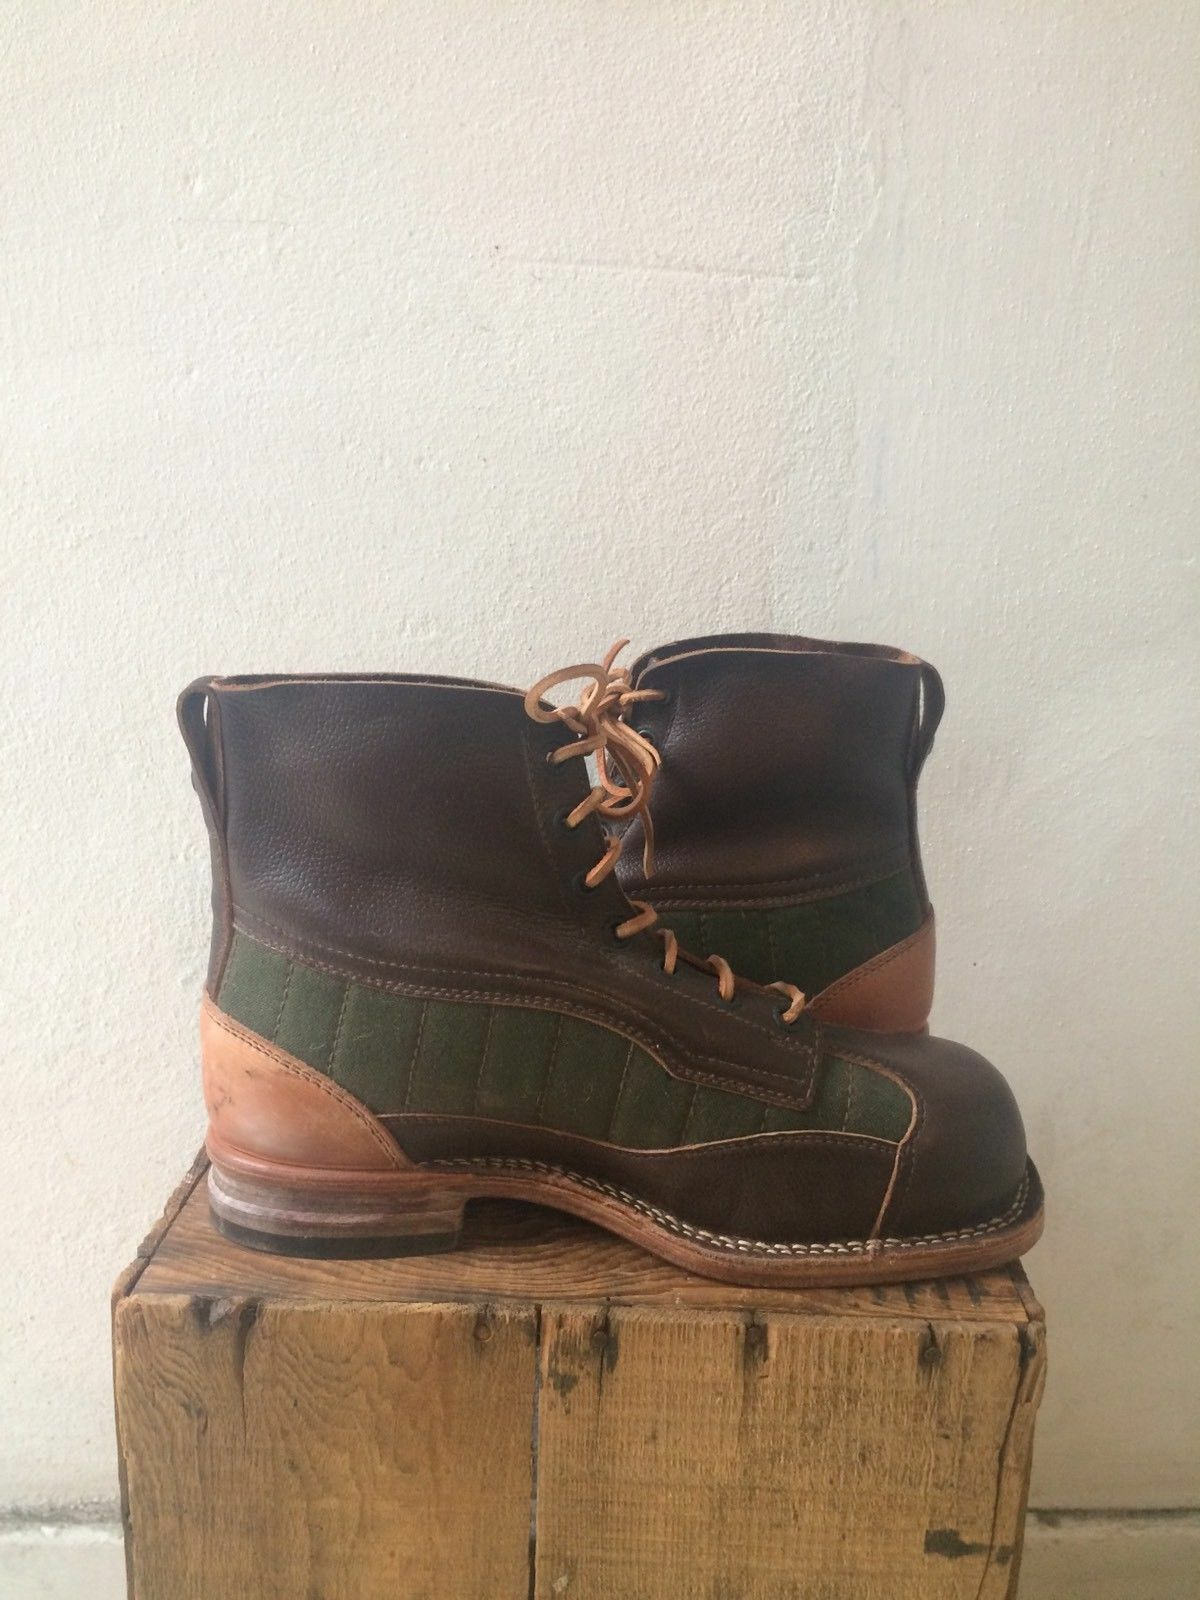 Swedish Mountain Army Boots  Leather Uppers eu 42 42 eu Vintage Surplus hobnail 36c6d6